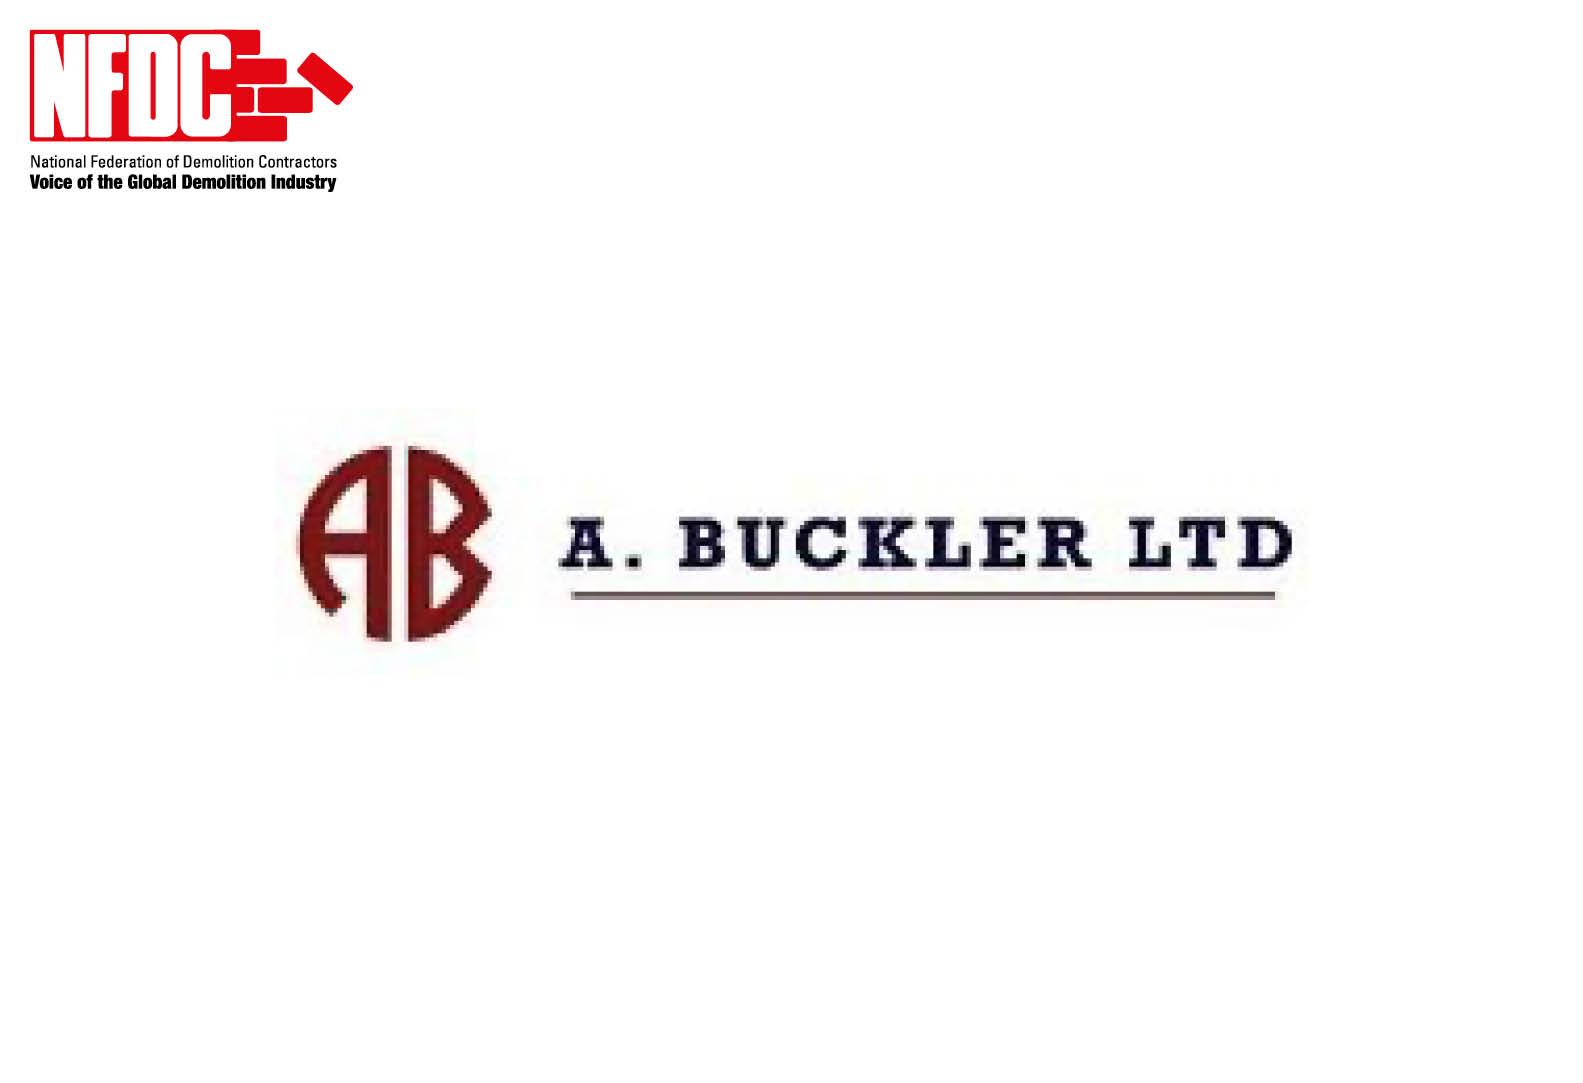 A Buckler